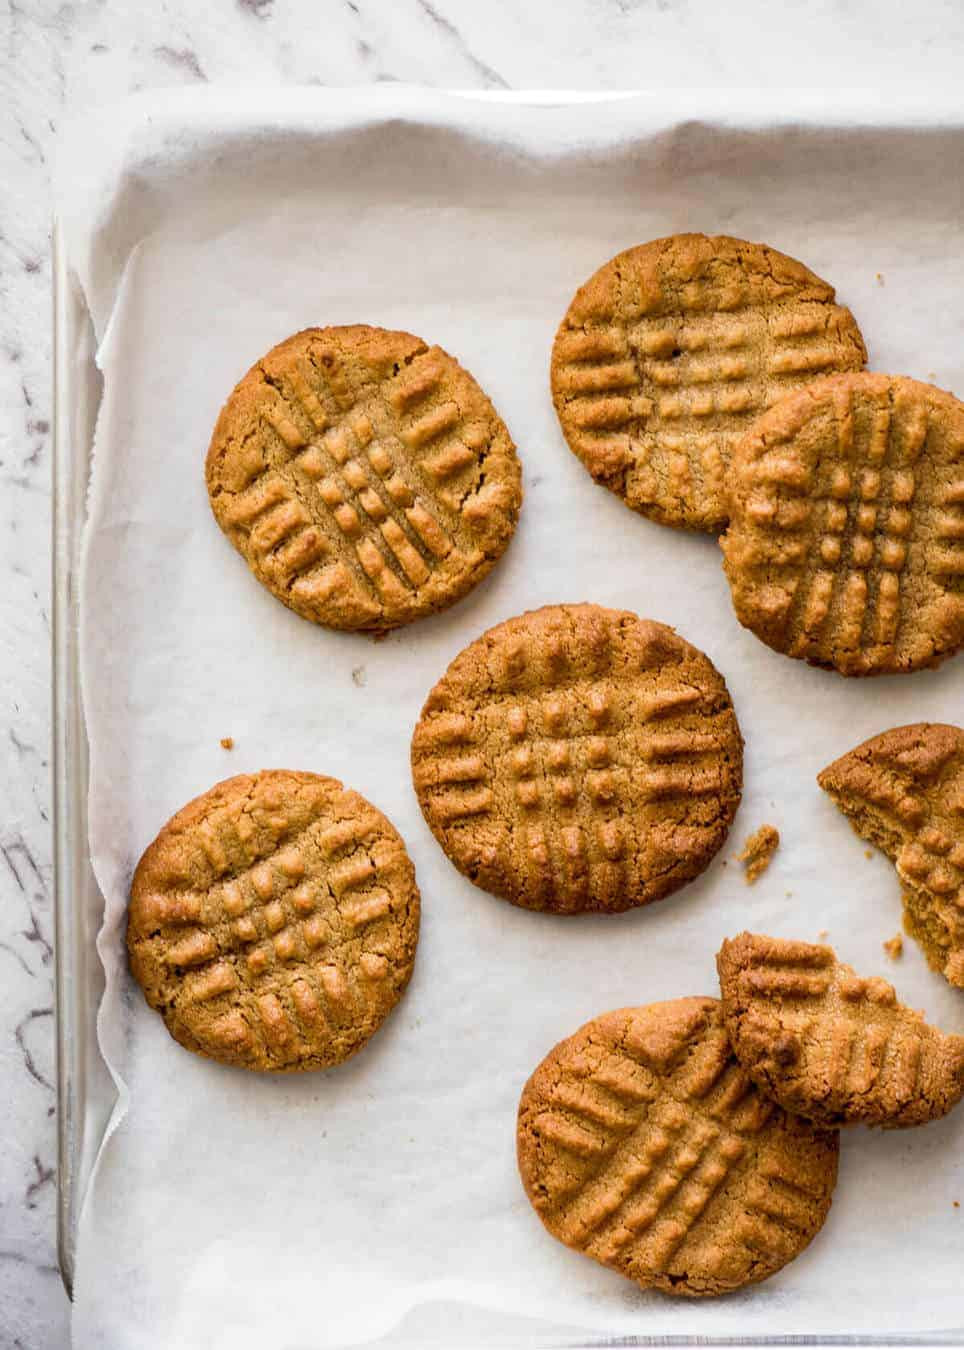 Easy Peanut Butter Cookies  World s Best Easy Peanut Butter Cookies